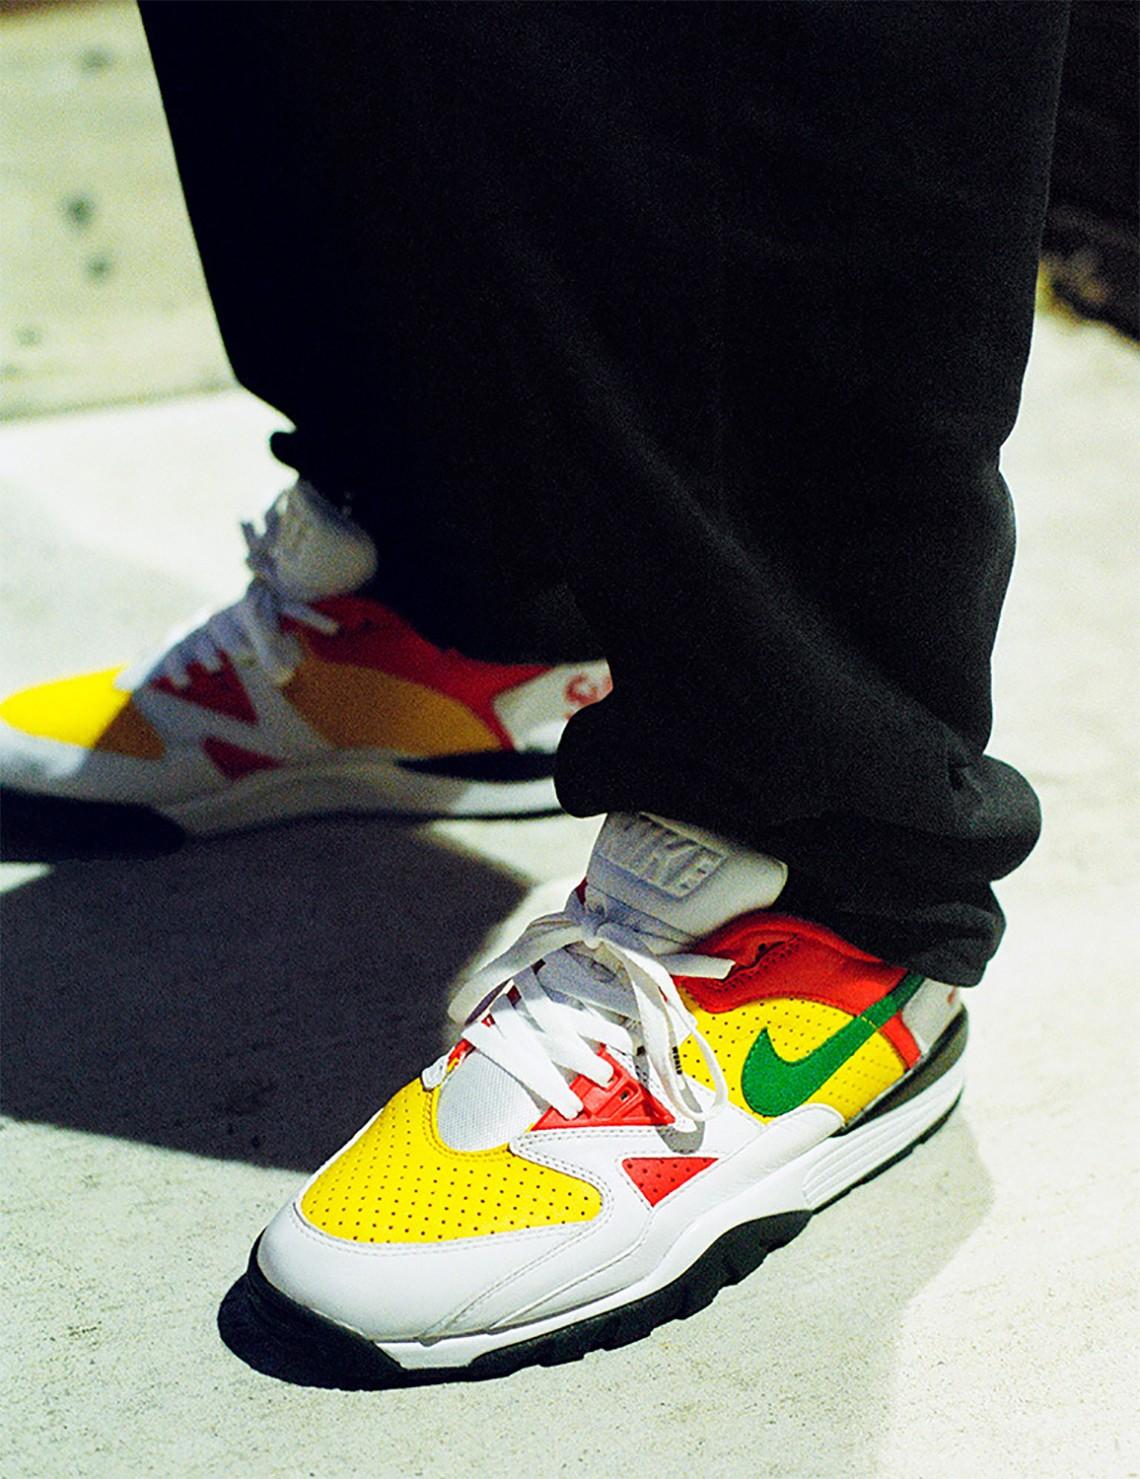 Supreme,Nike, Air Cross Traine  这不是 Gucci 配色吗?全新 Supreme x Nike 鞋款明日发售!